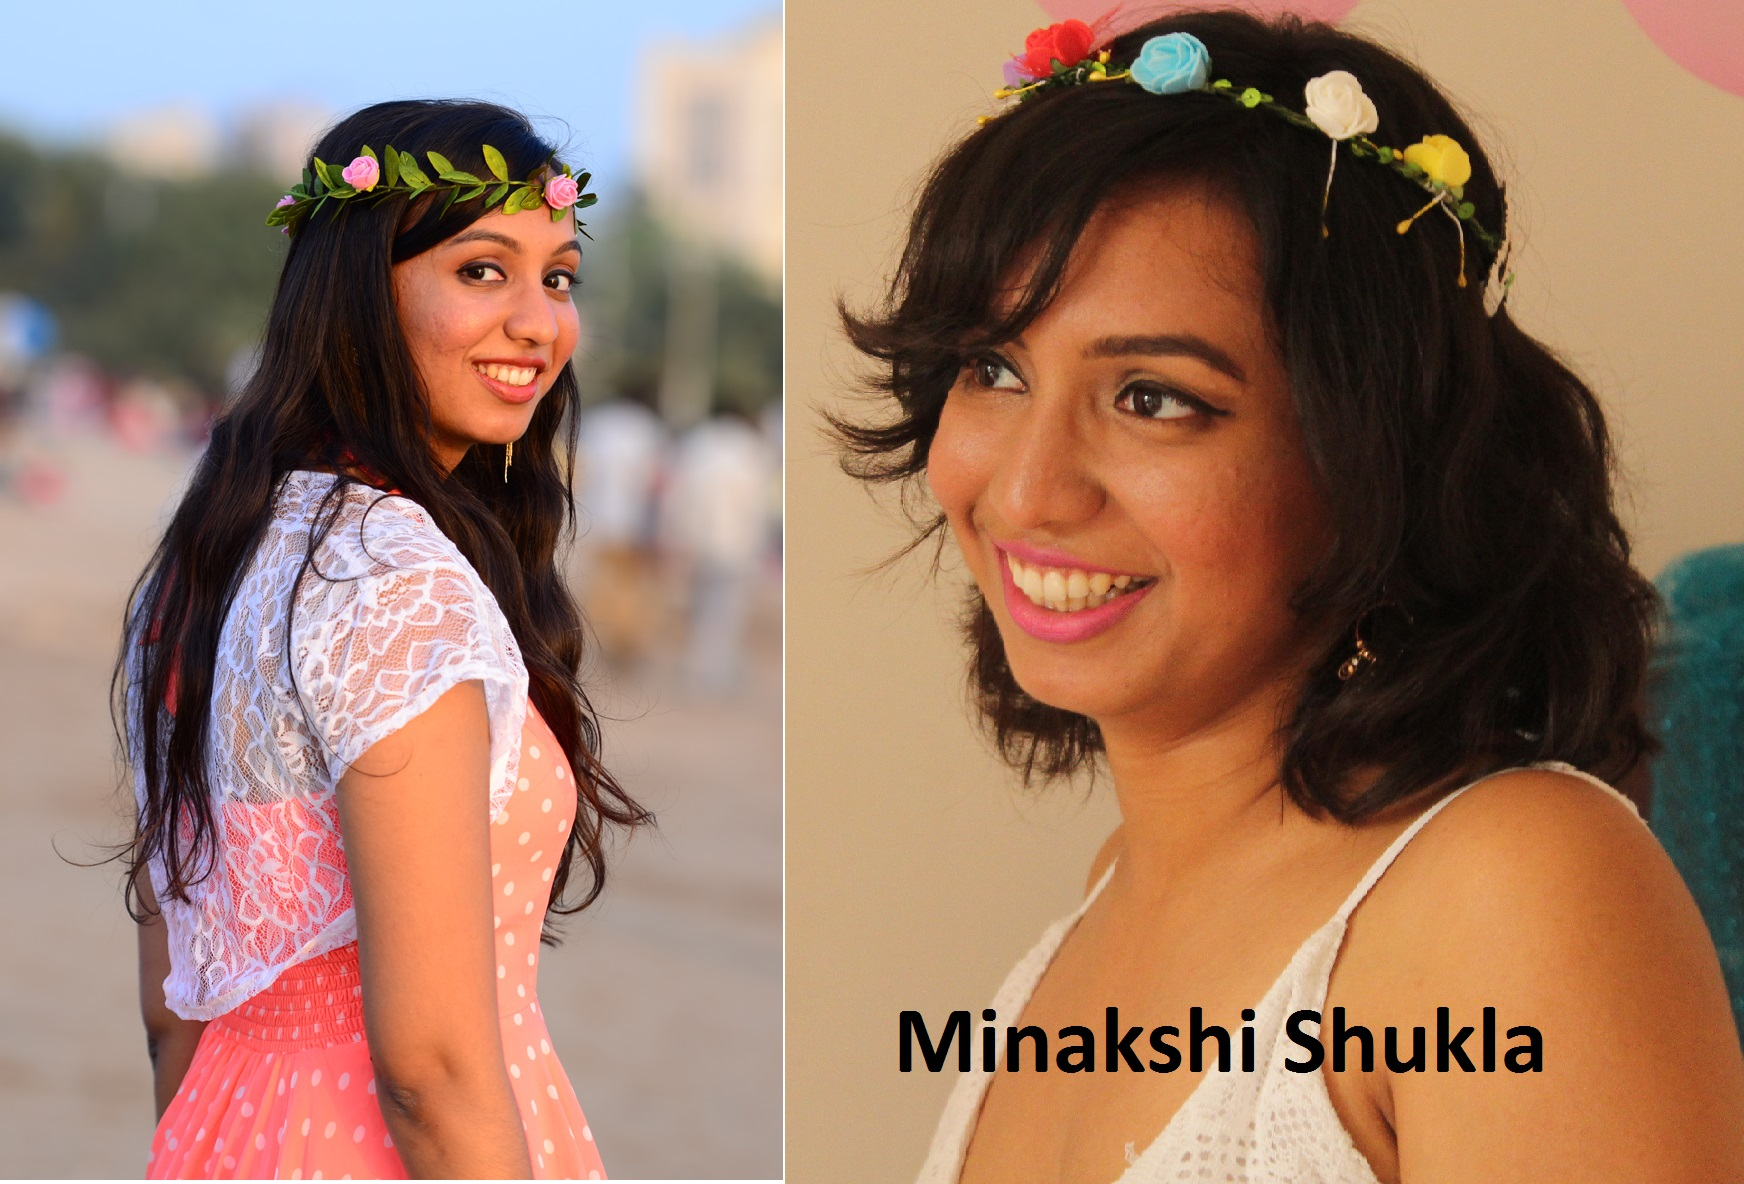 Minakshi Shukla